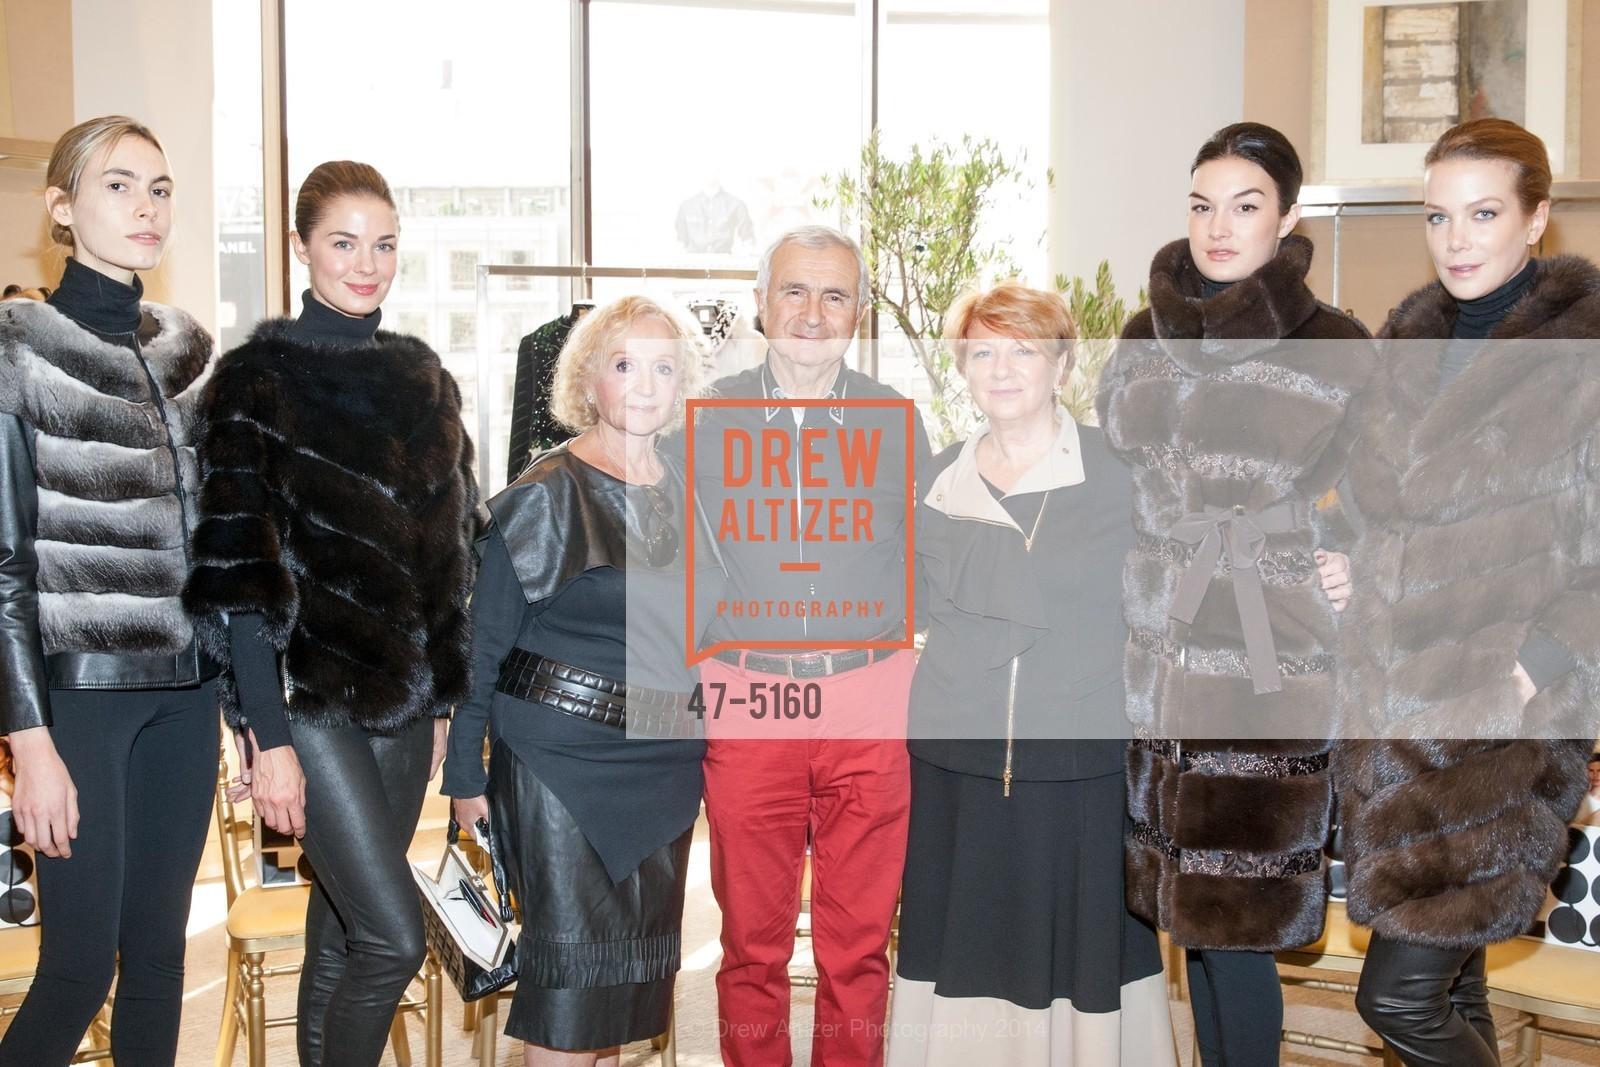 Logan Link, Rozalya Schrayver, Ernest Schrayver, Giuliana Teso, Hannah Fugazzi, Rachel Sitz, Photo #47-5160